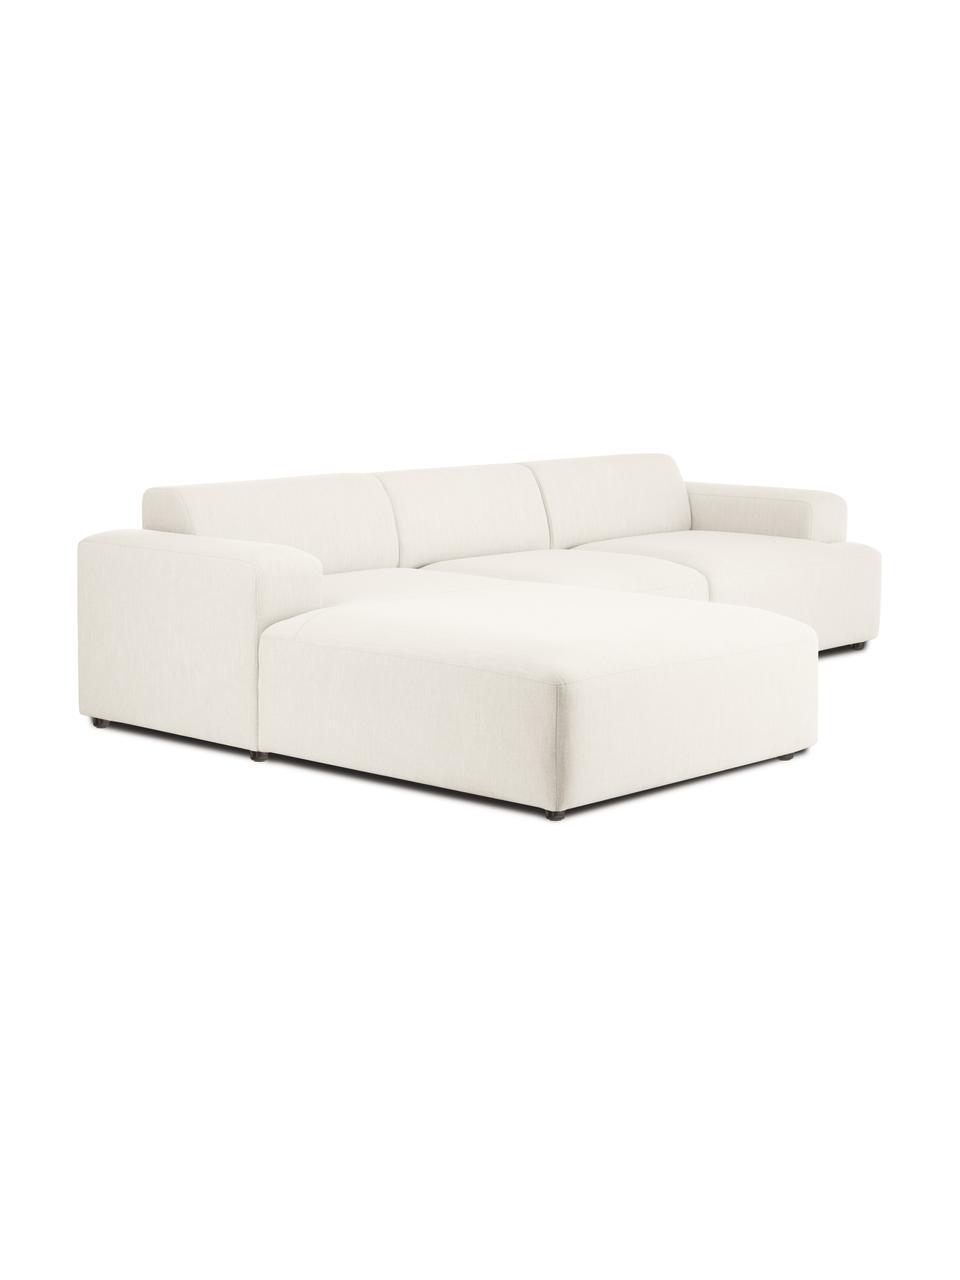 Hoekbank Melva (4-zits) in beige, Bekleding: 100% polyester, Frame: massief grenenhout, FSC-g, Poten: kunststof, Geweven stof beige, B 319 x D 196 cm